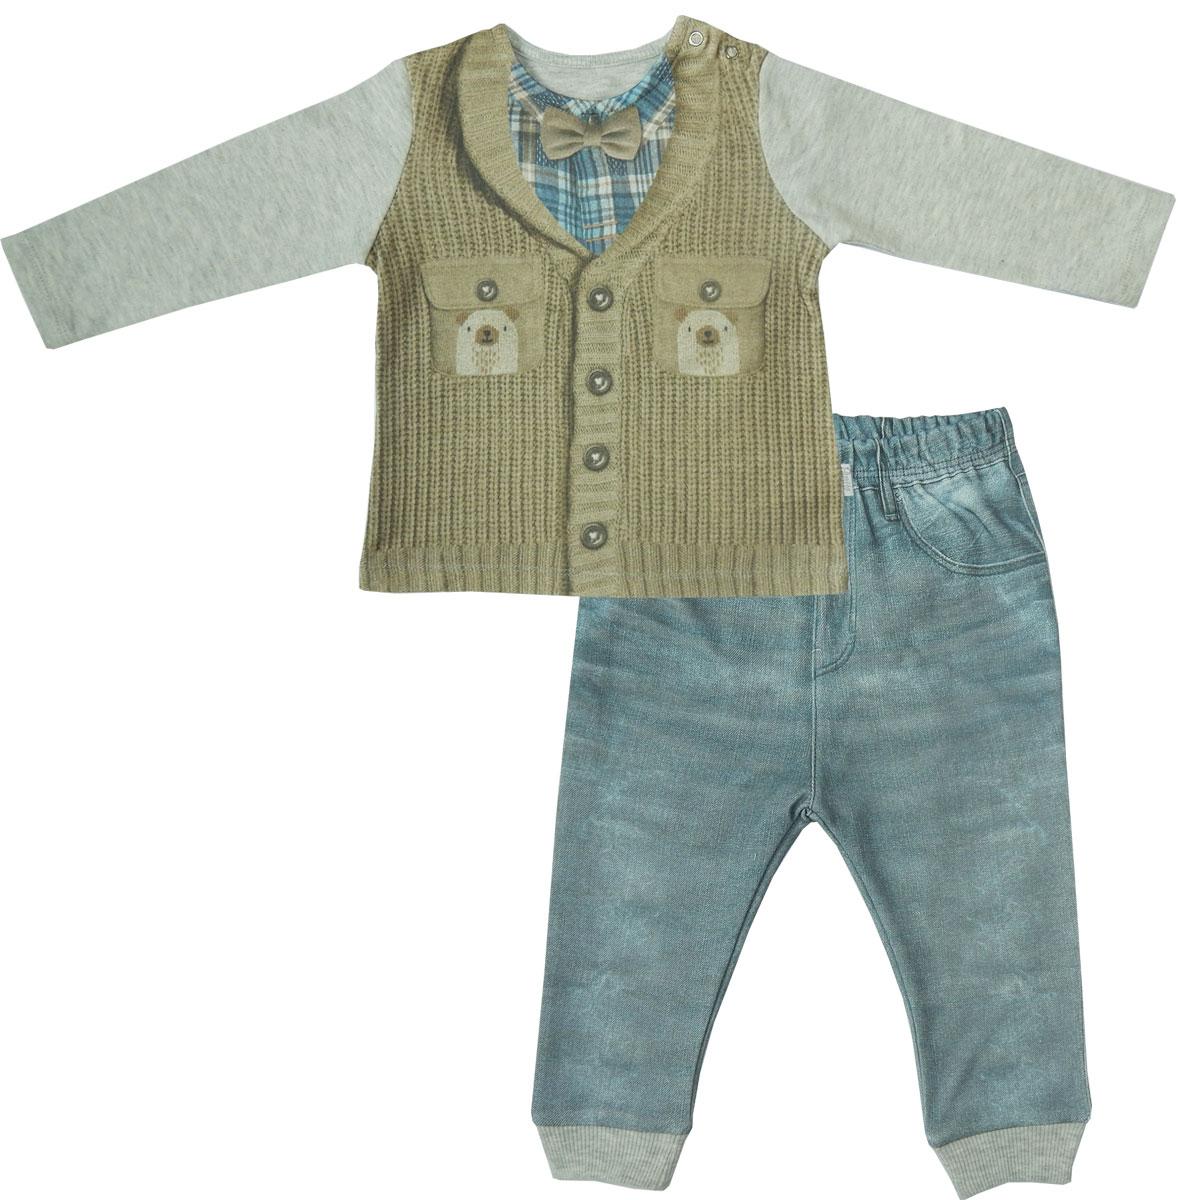 Комплект одежды Папитто для мальчика Fashion Jeans 584-05 серый/синий р.22-74